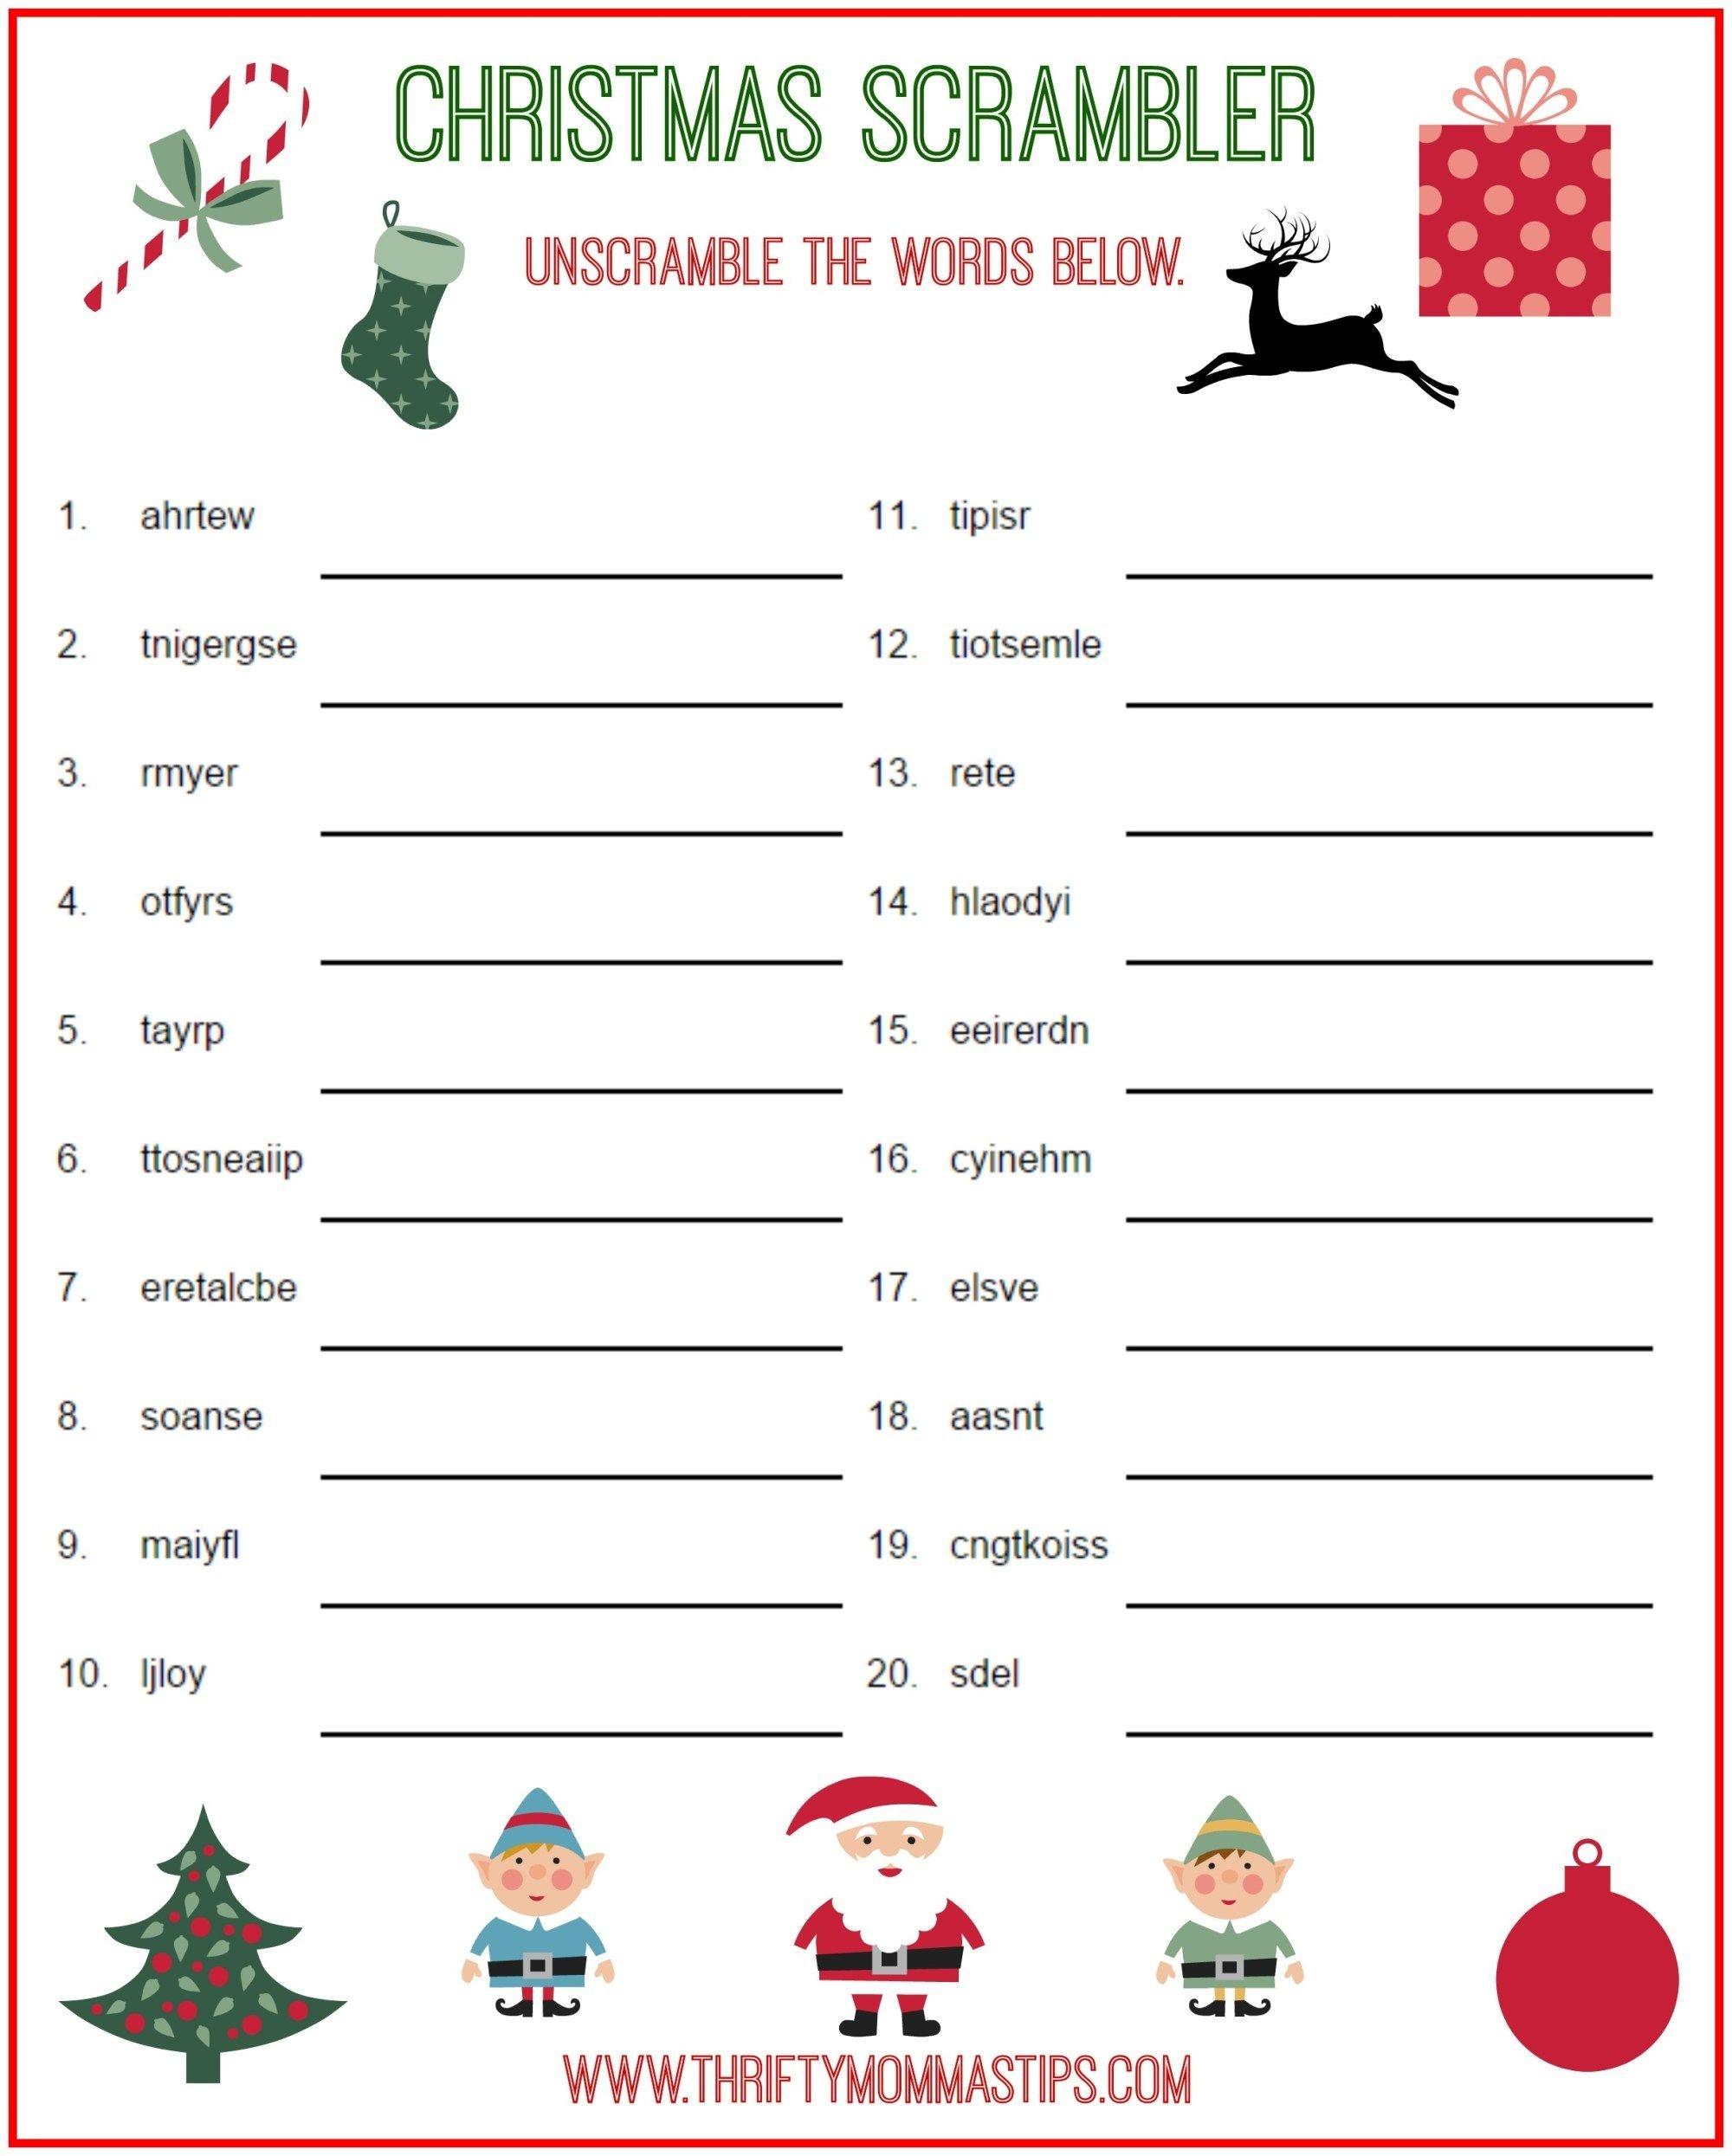 Christmas Scrambler Free Kids Puzzle Printables | Christmas Family - Christmas Song Scramble Free Printable